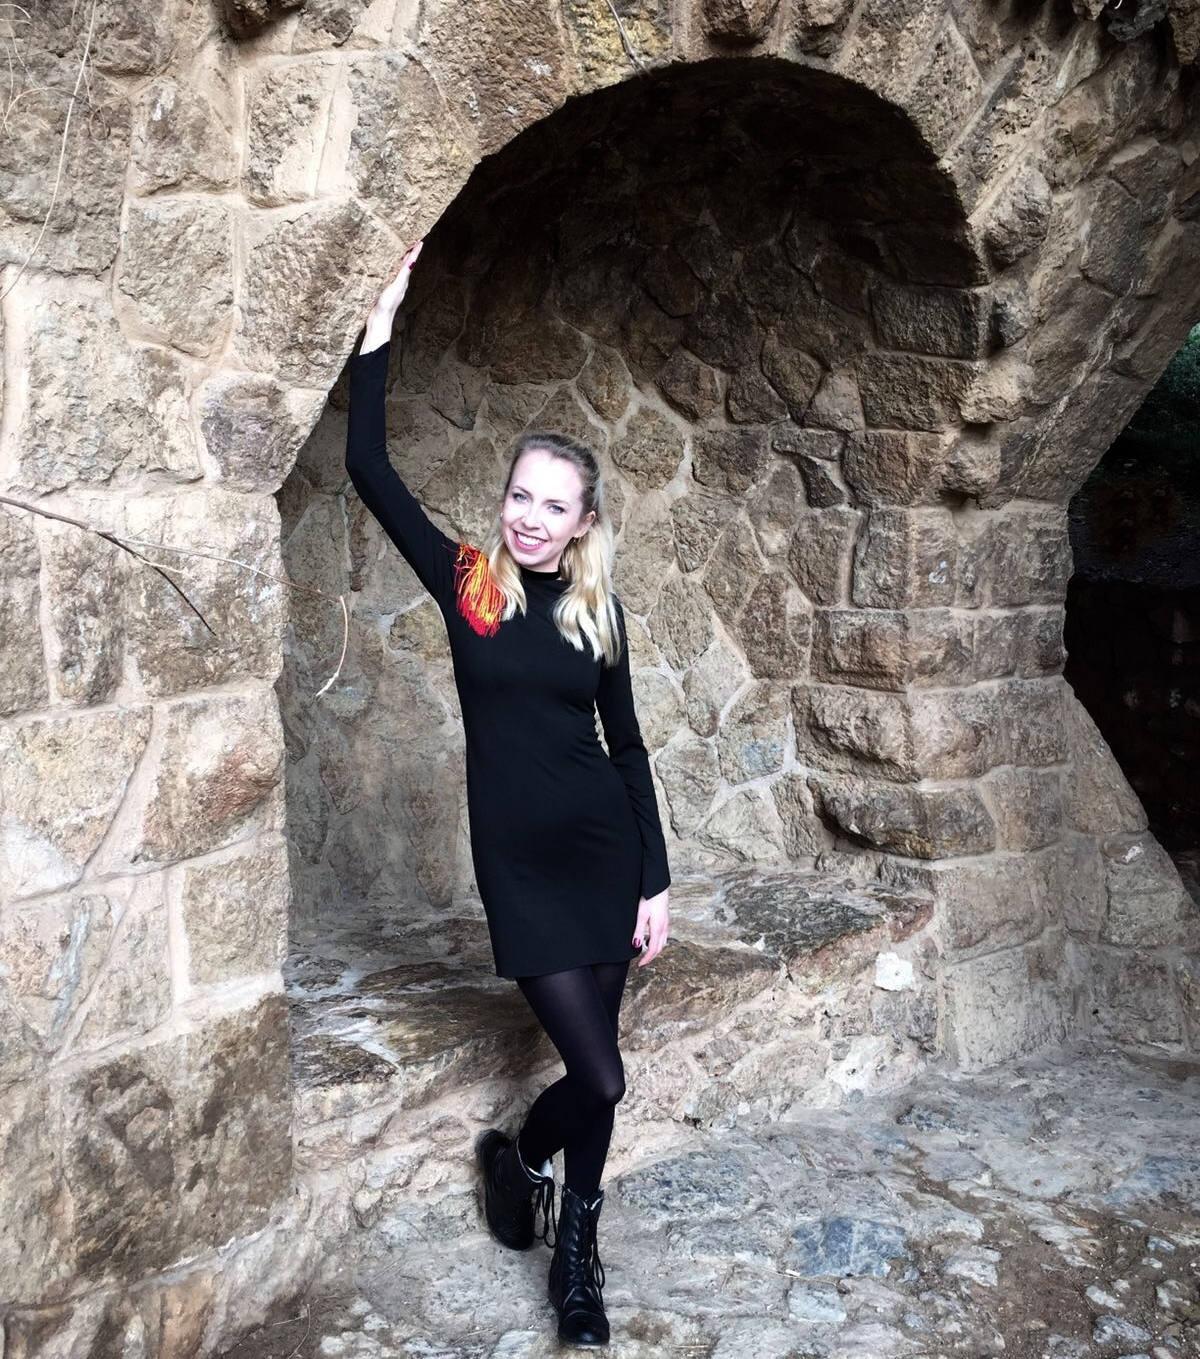 barcelona miasteczko palau guell gaudi igla nosi iglawpodrozy